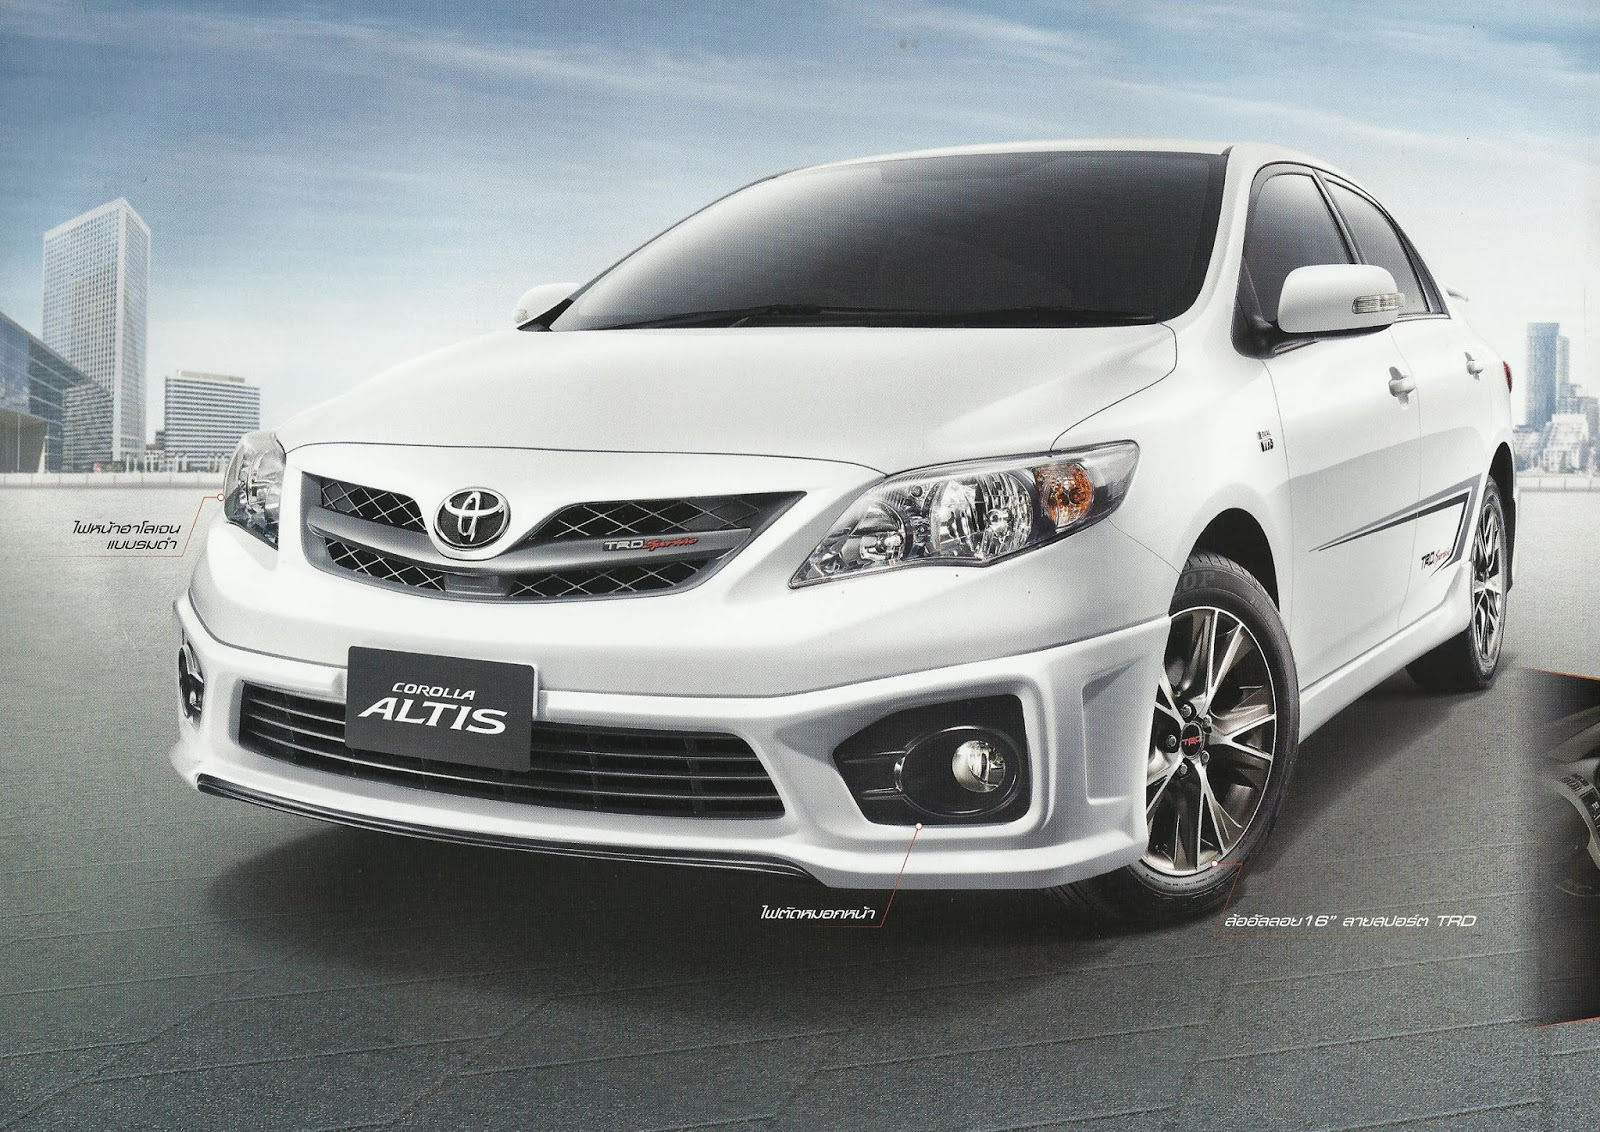 brand new toyota altis for sale philippines jual grand avanza bekas di depok corolla trd sportivo 2014 car price in